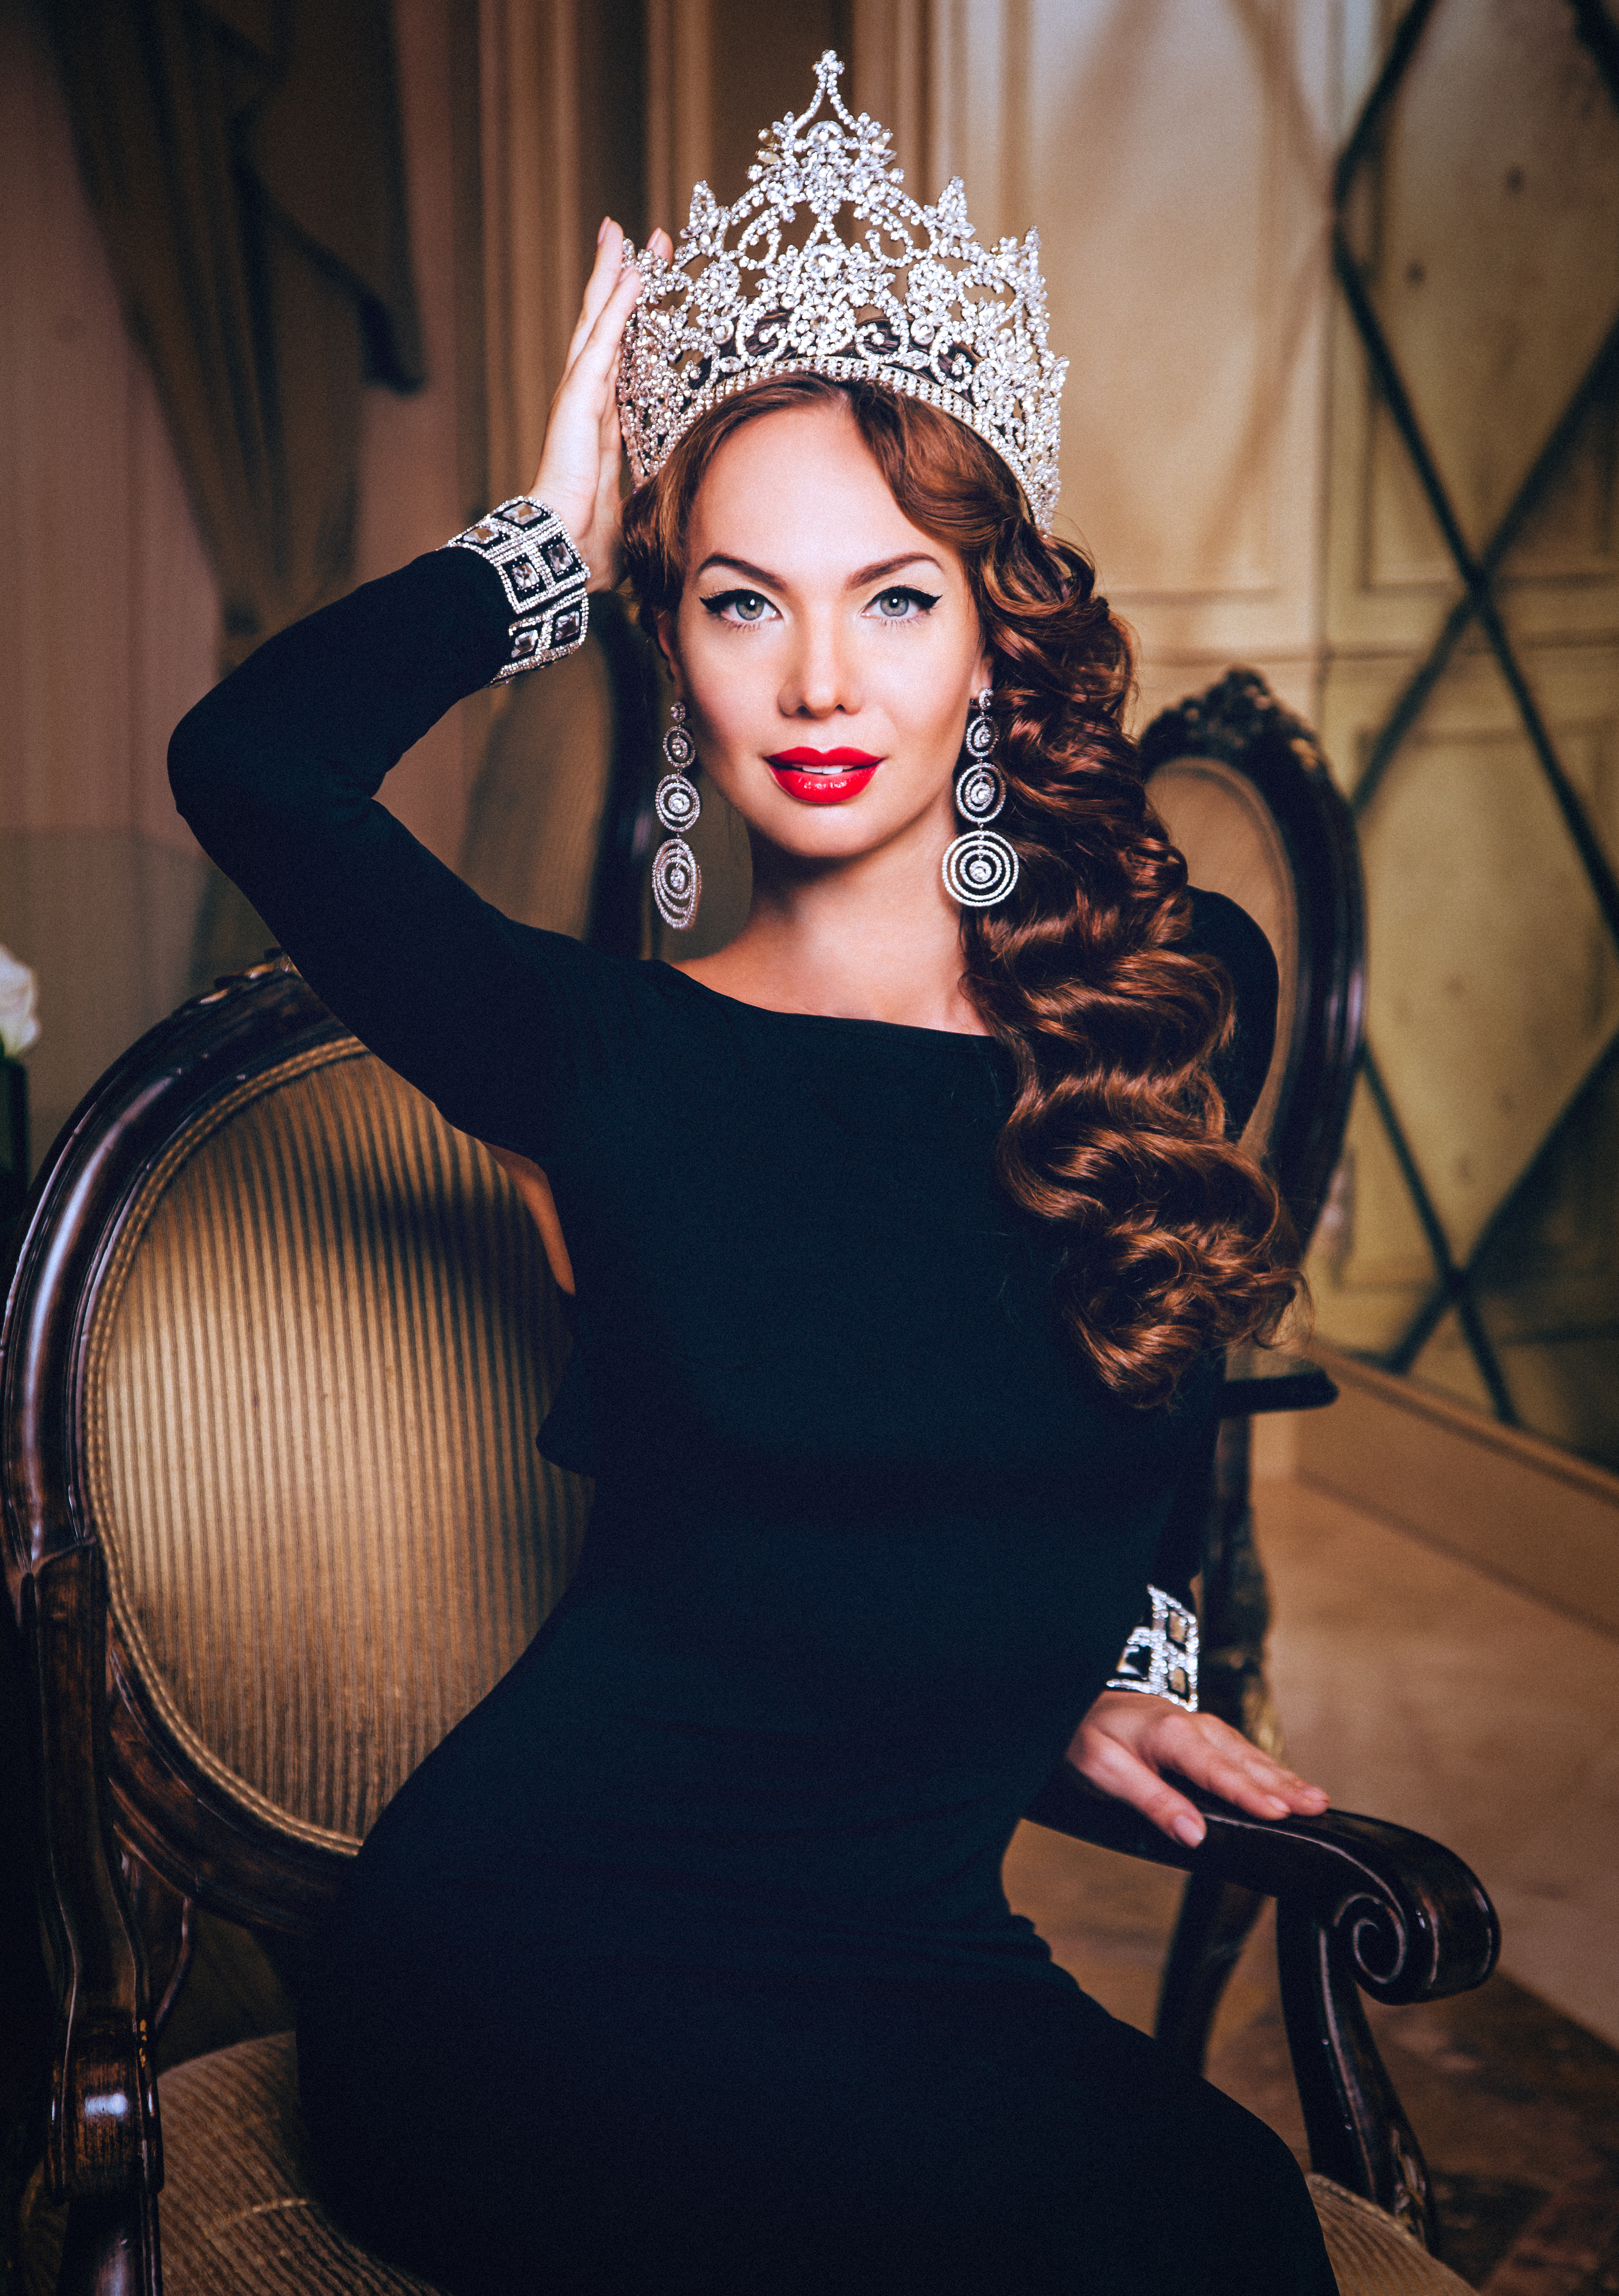 Miami Spotlight - Anna Garbuzova - The Miami Social Magazine